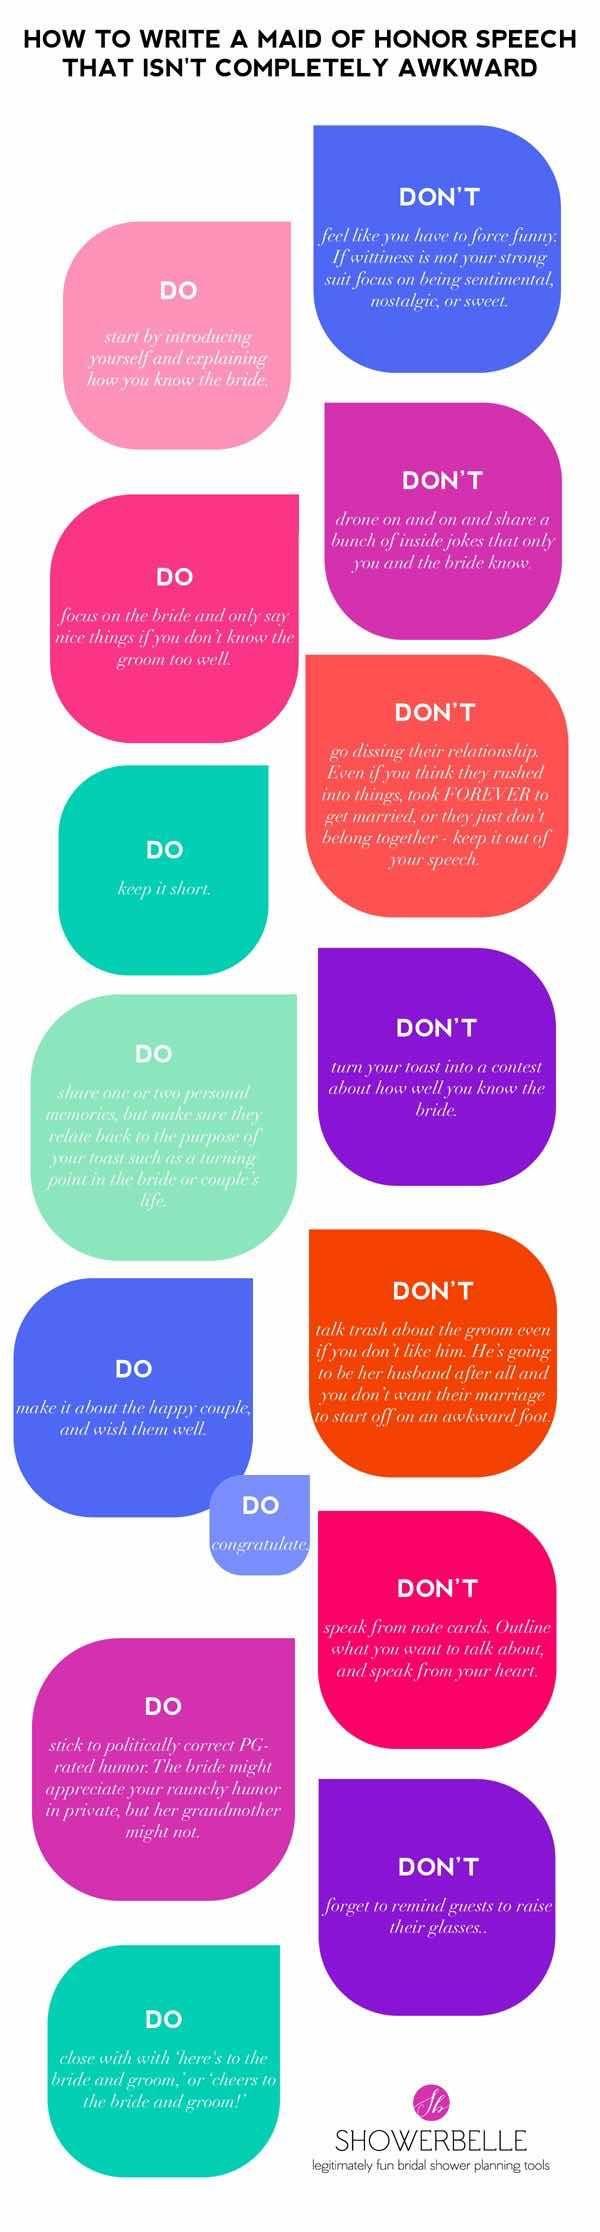 Wedding Planning: Maid Of Honor Duties Checklist